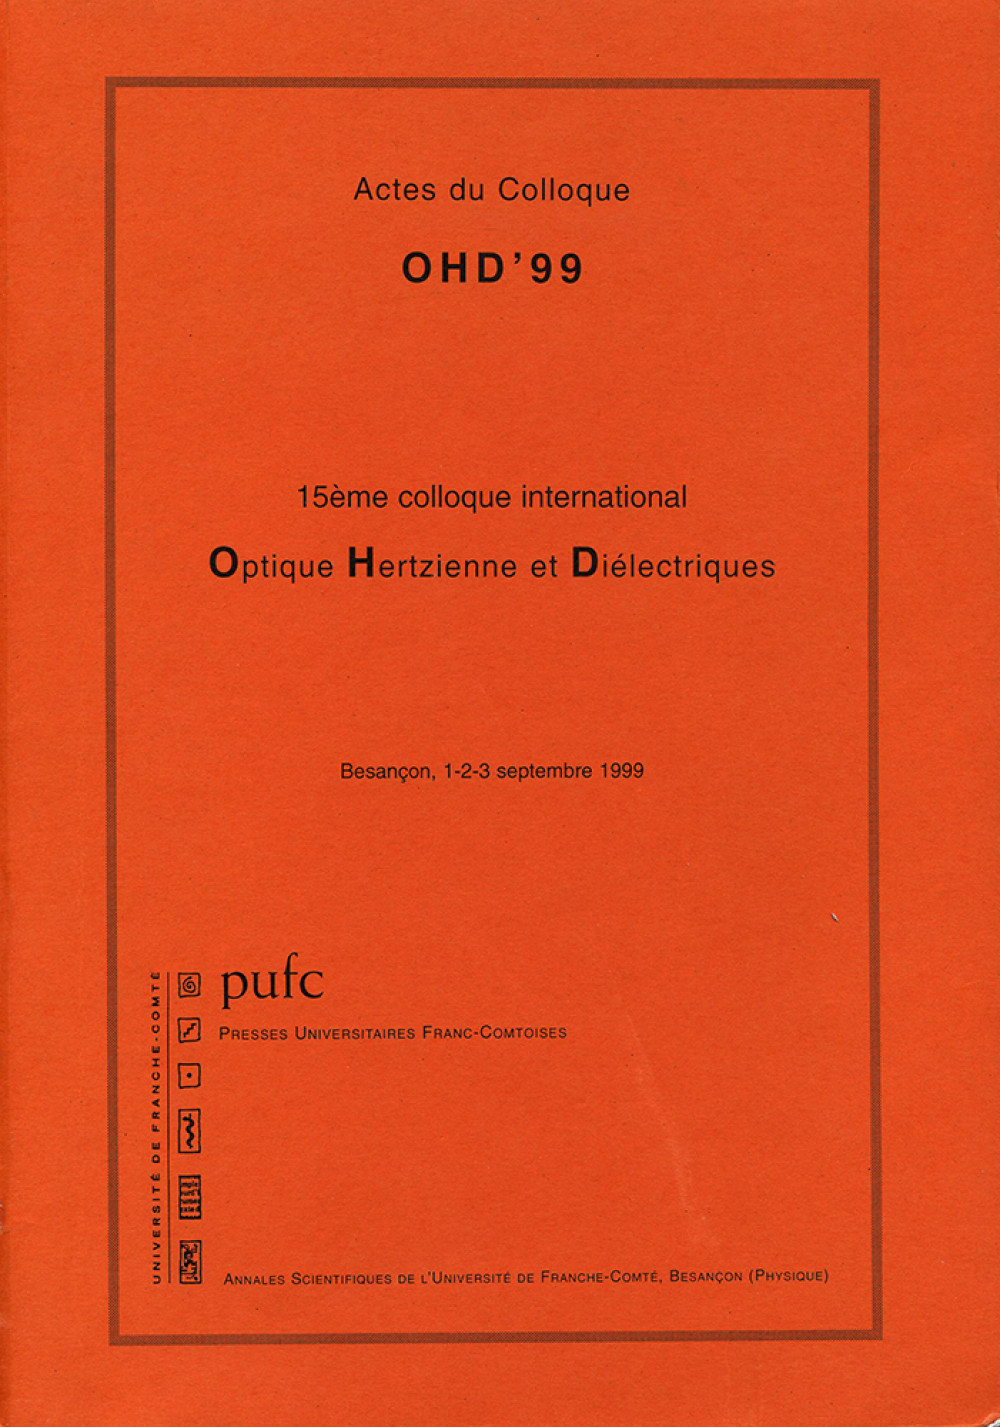 Colloque OHD'99 (optique) septembre 1999